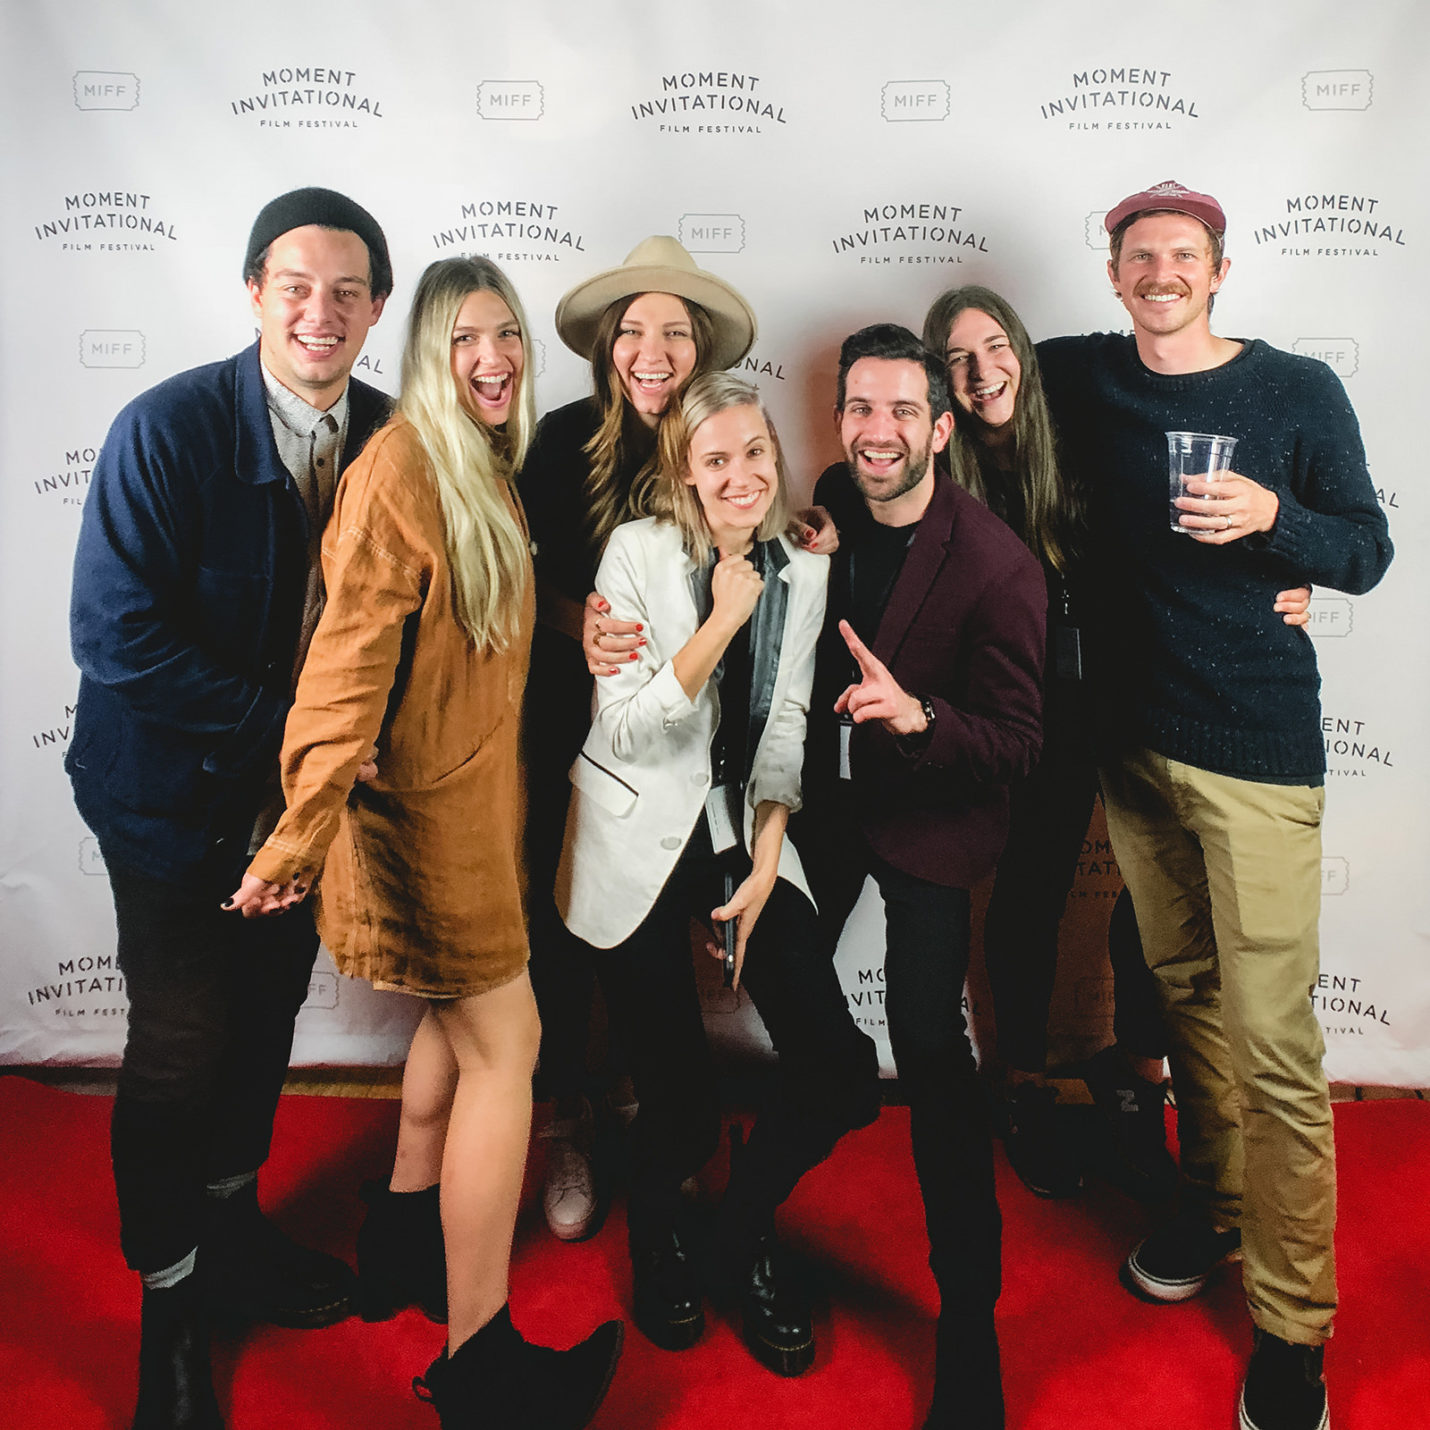 Moment Invitational: Film Festival Recap + Voting - Moment